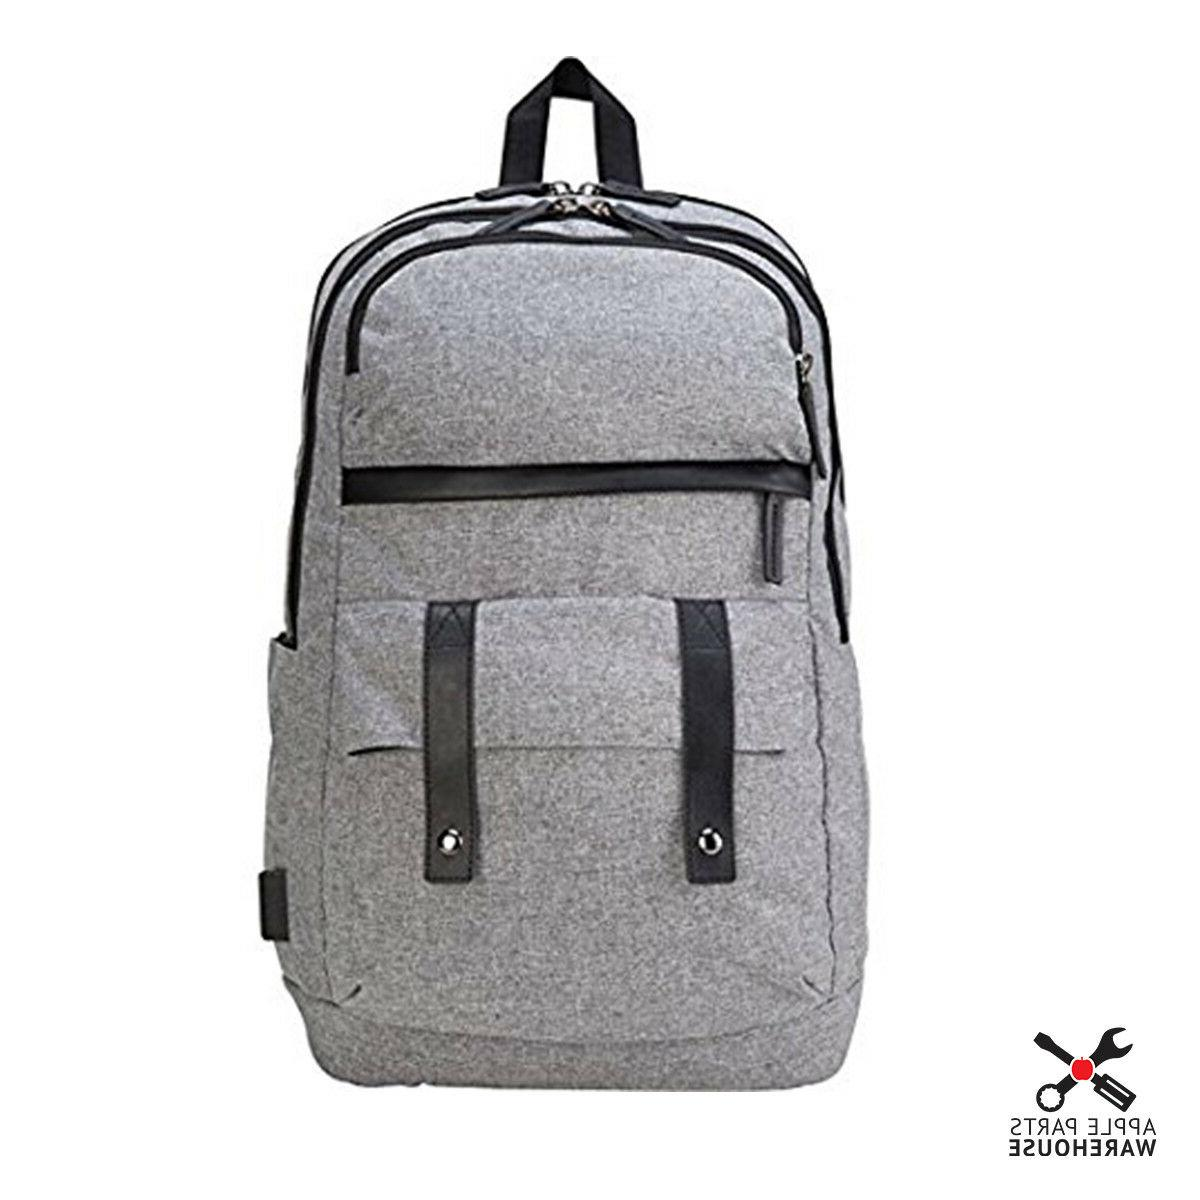 "Targus 15.6"" Lifestyle Backpack Laptop Bag | Grey | TSB81704"